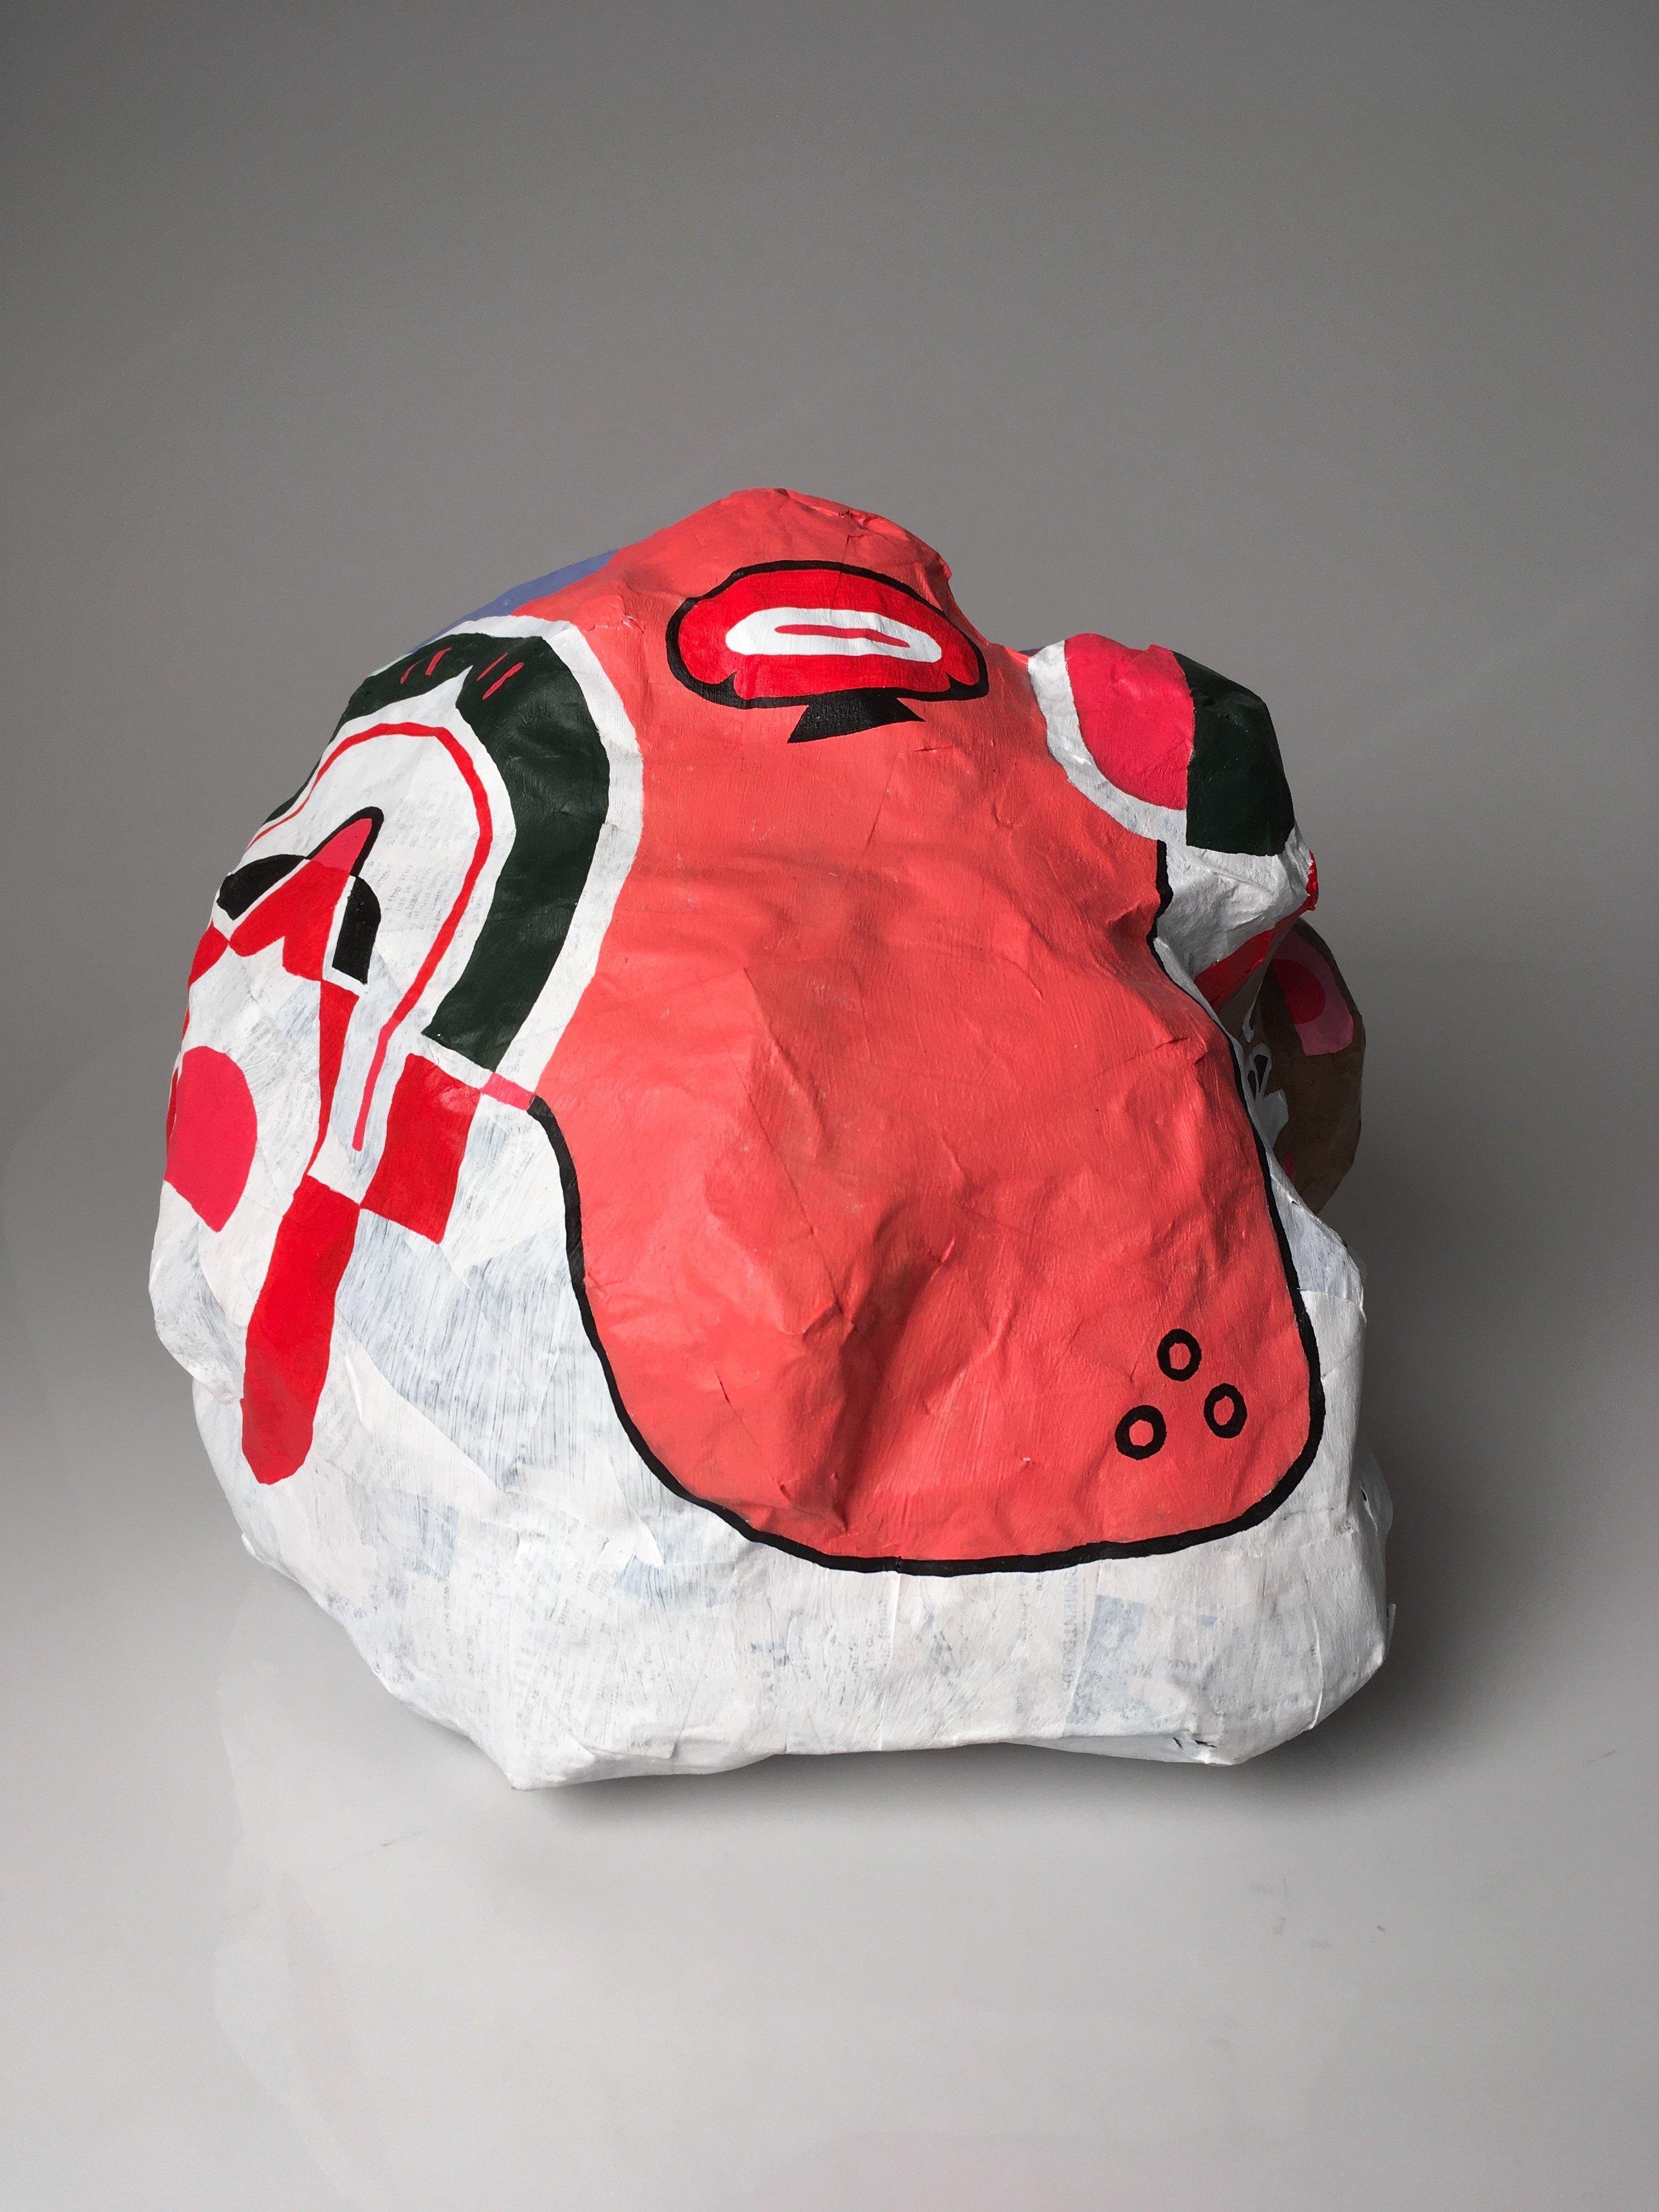 Head with Helmet –2018